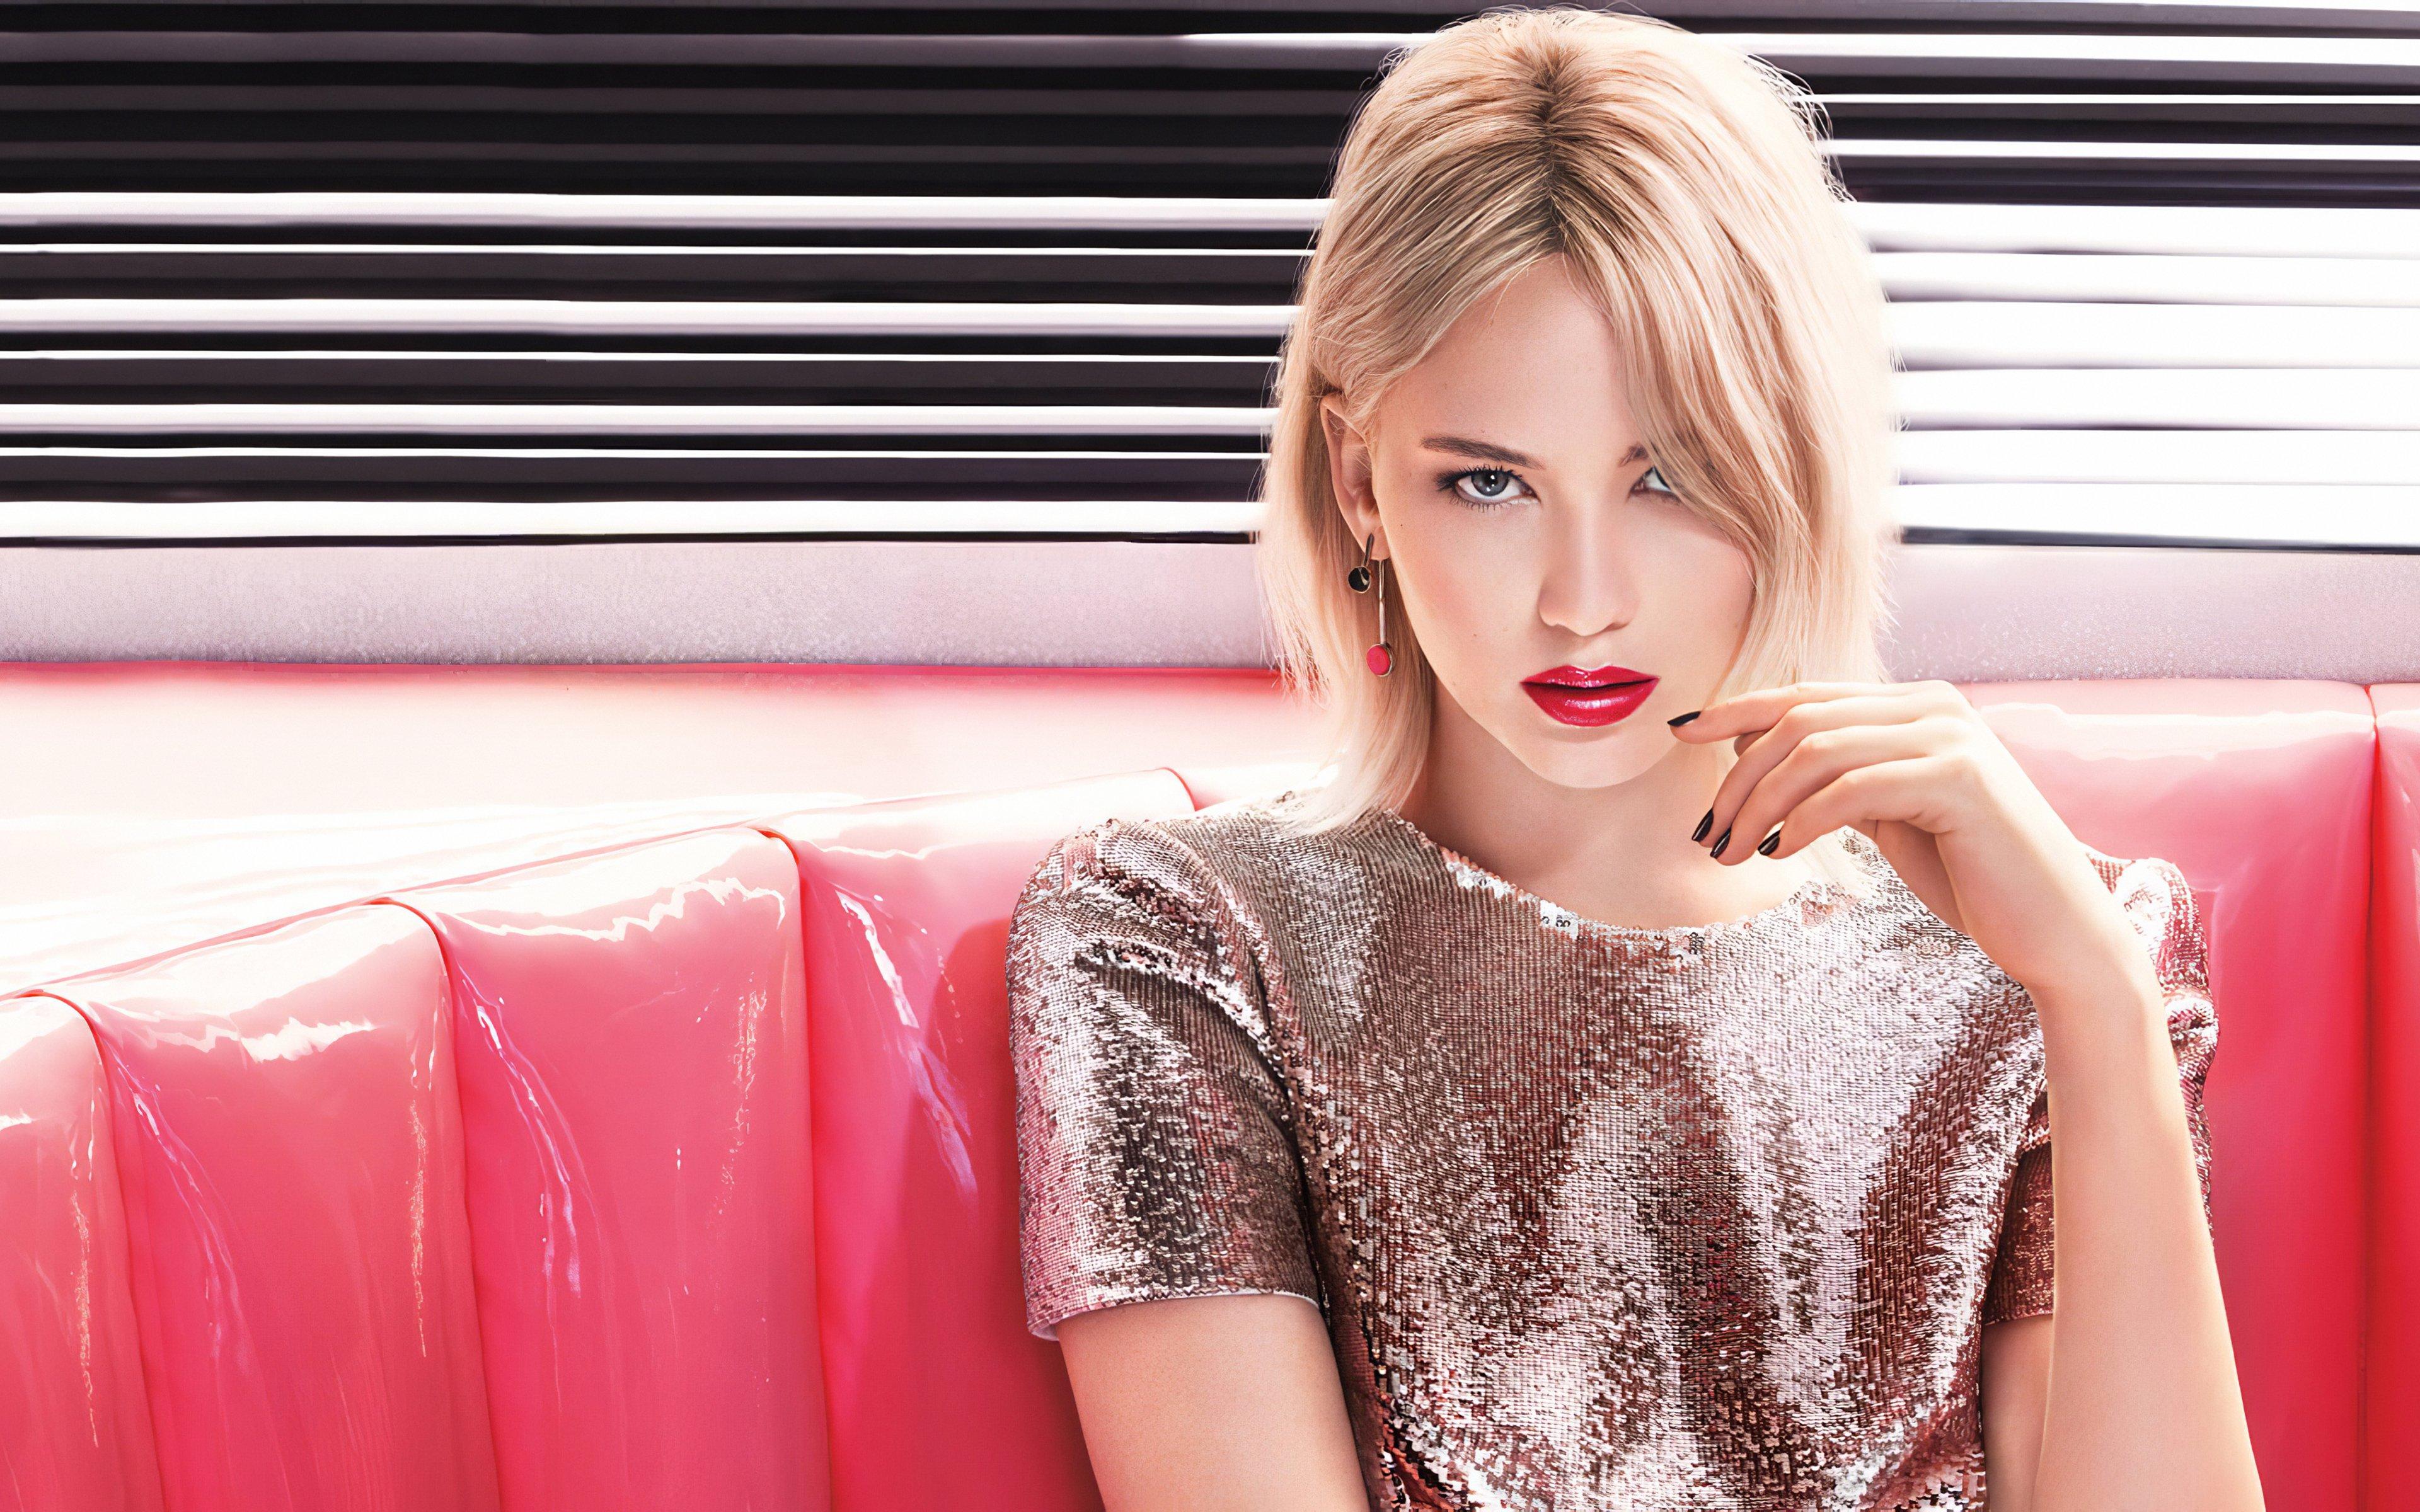 Fondos de pantalla Jennifer Lawrence con labios rojos